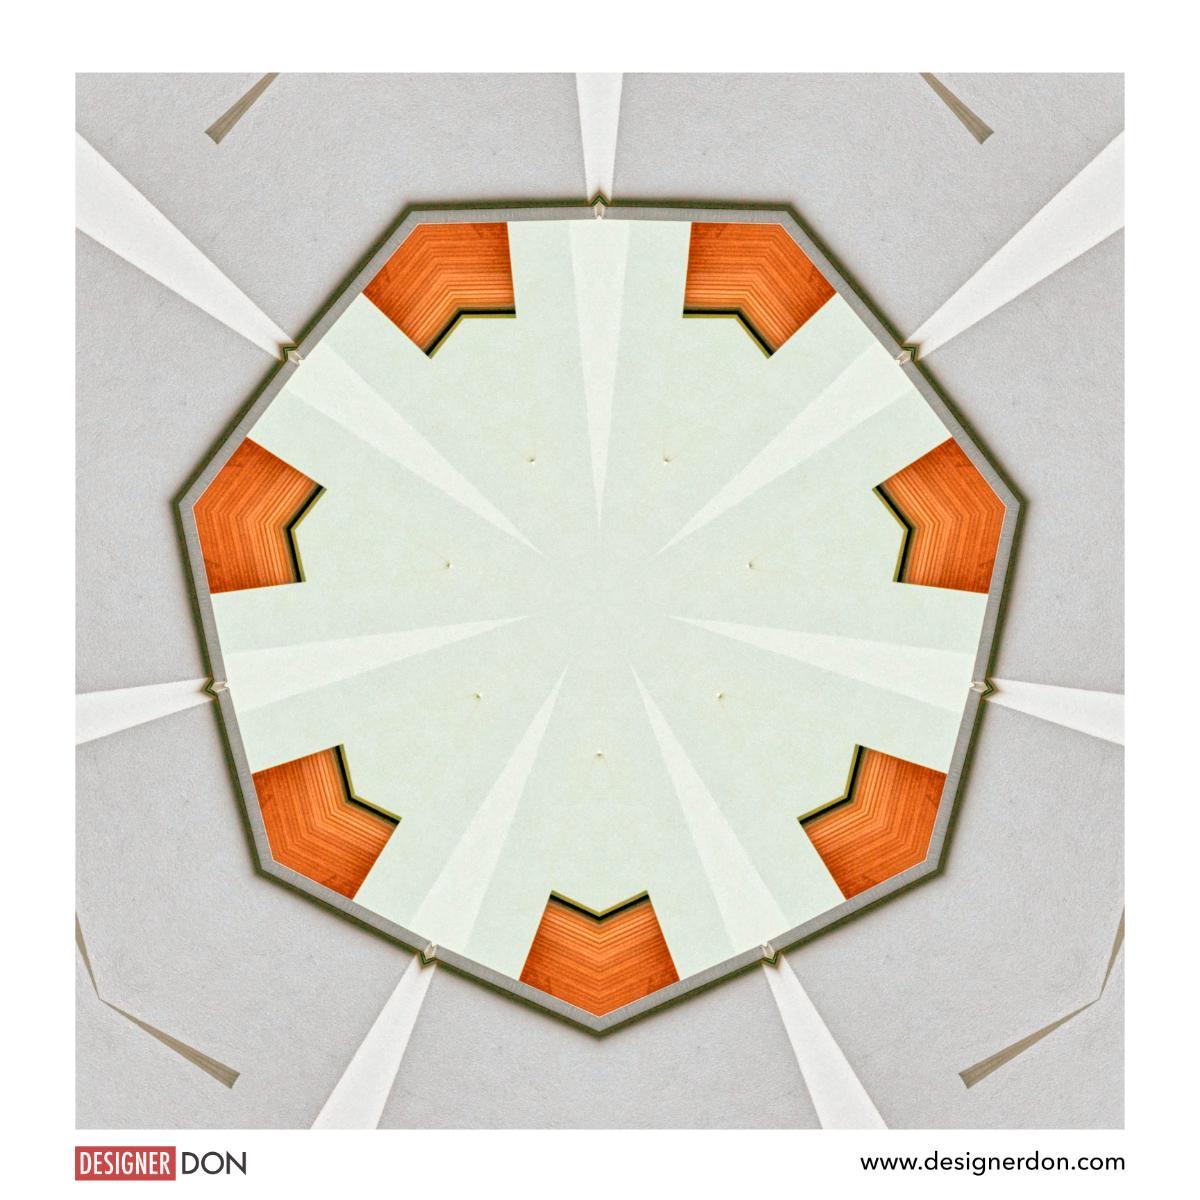 Zurich Geometrie: Geometric Digital Art Collection